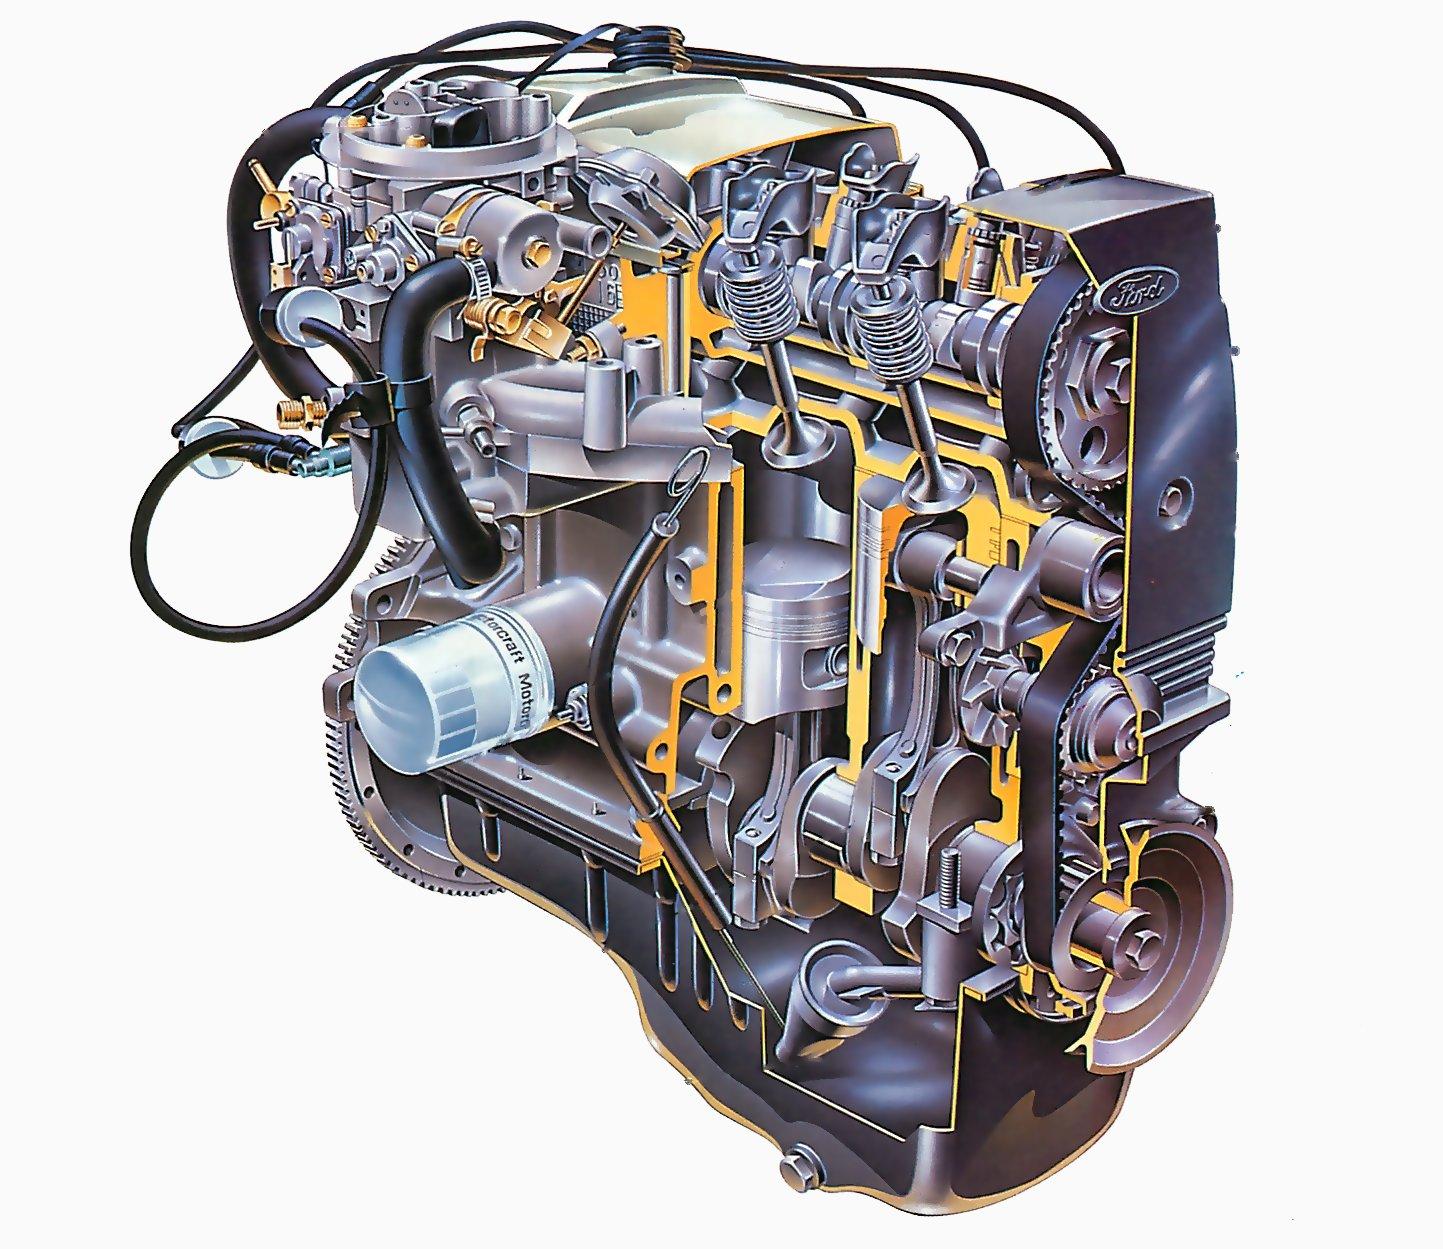 Lean burn engines